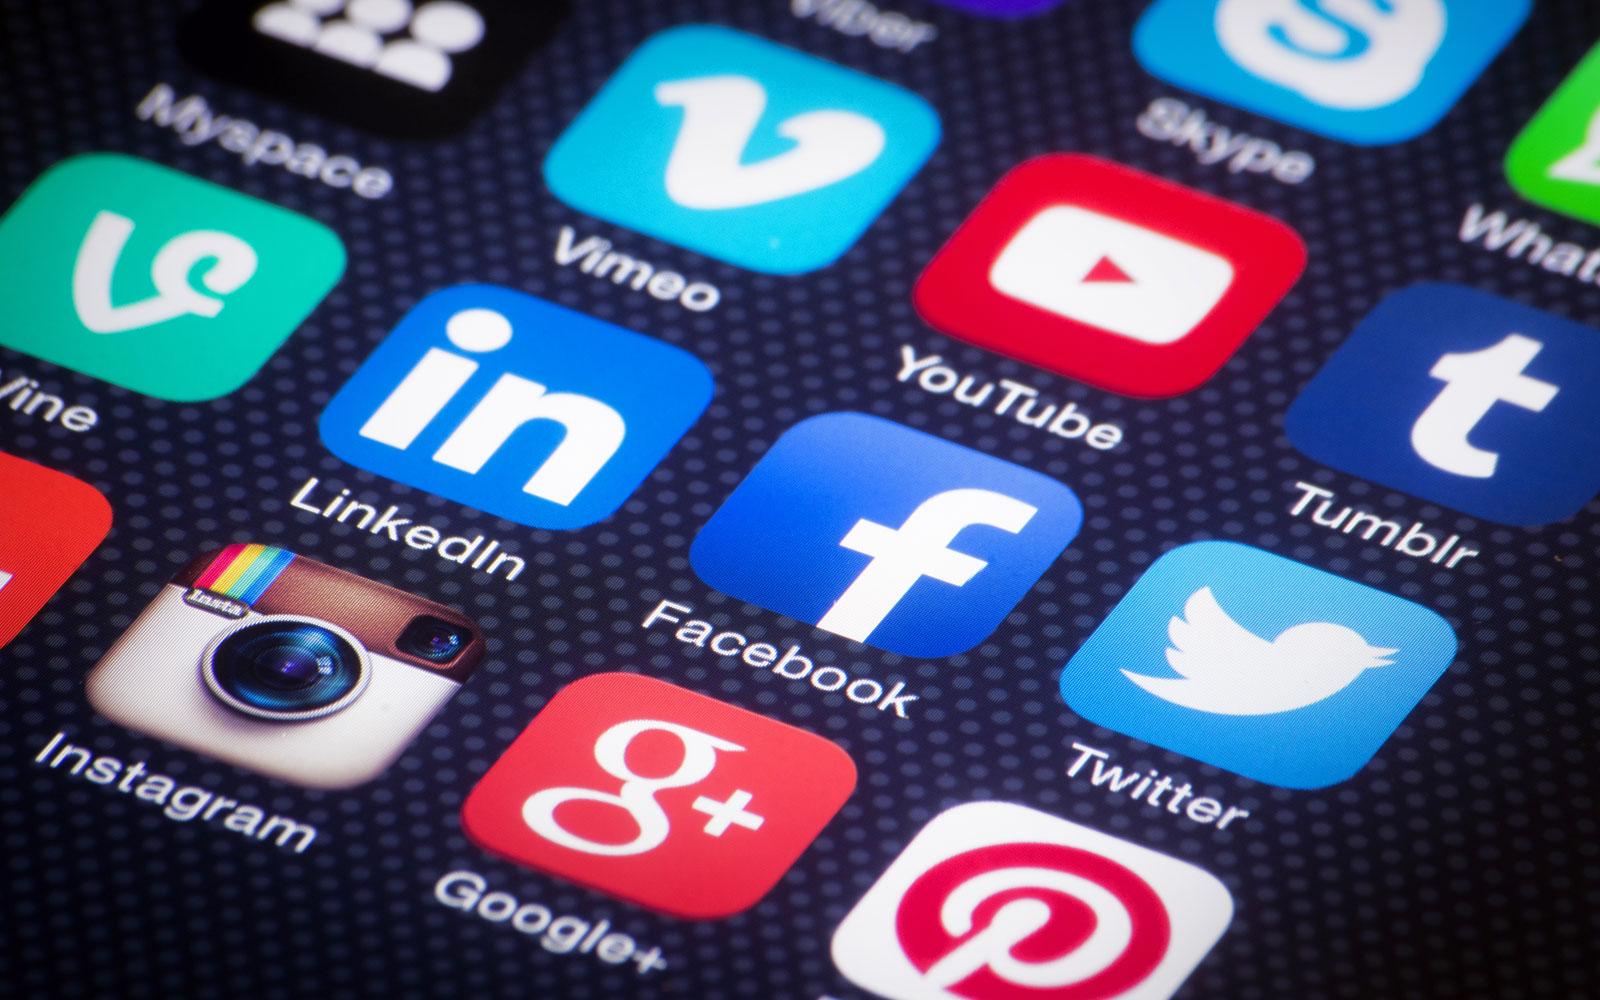 The power of social media!